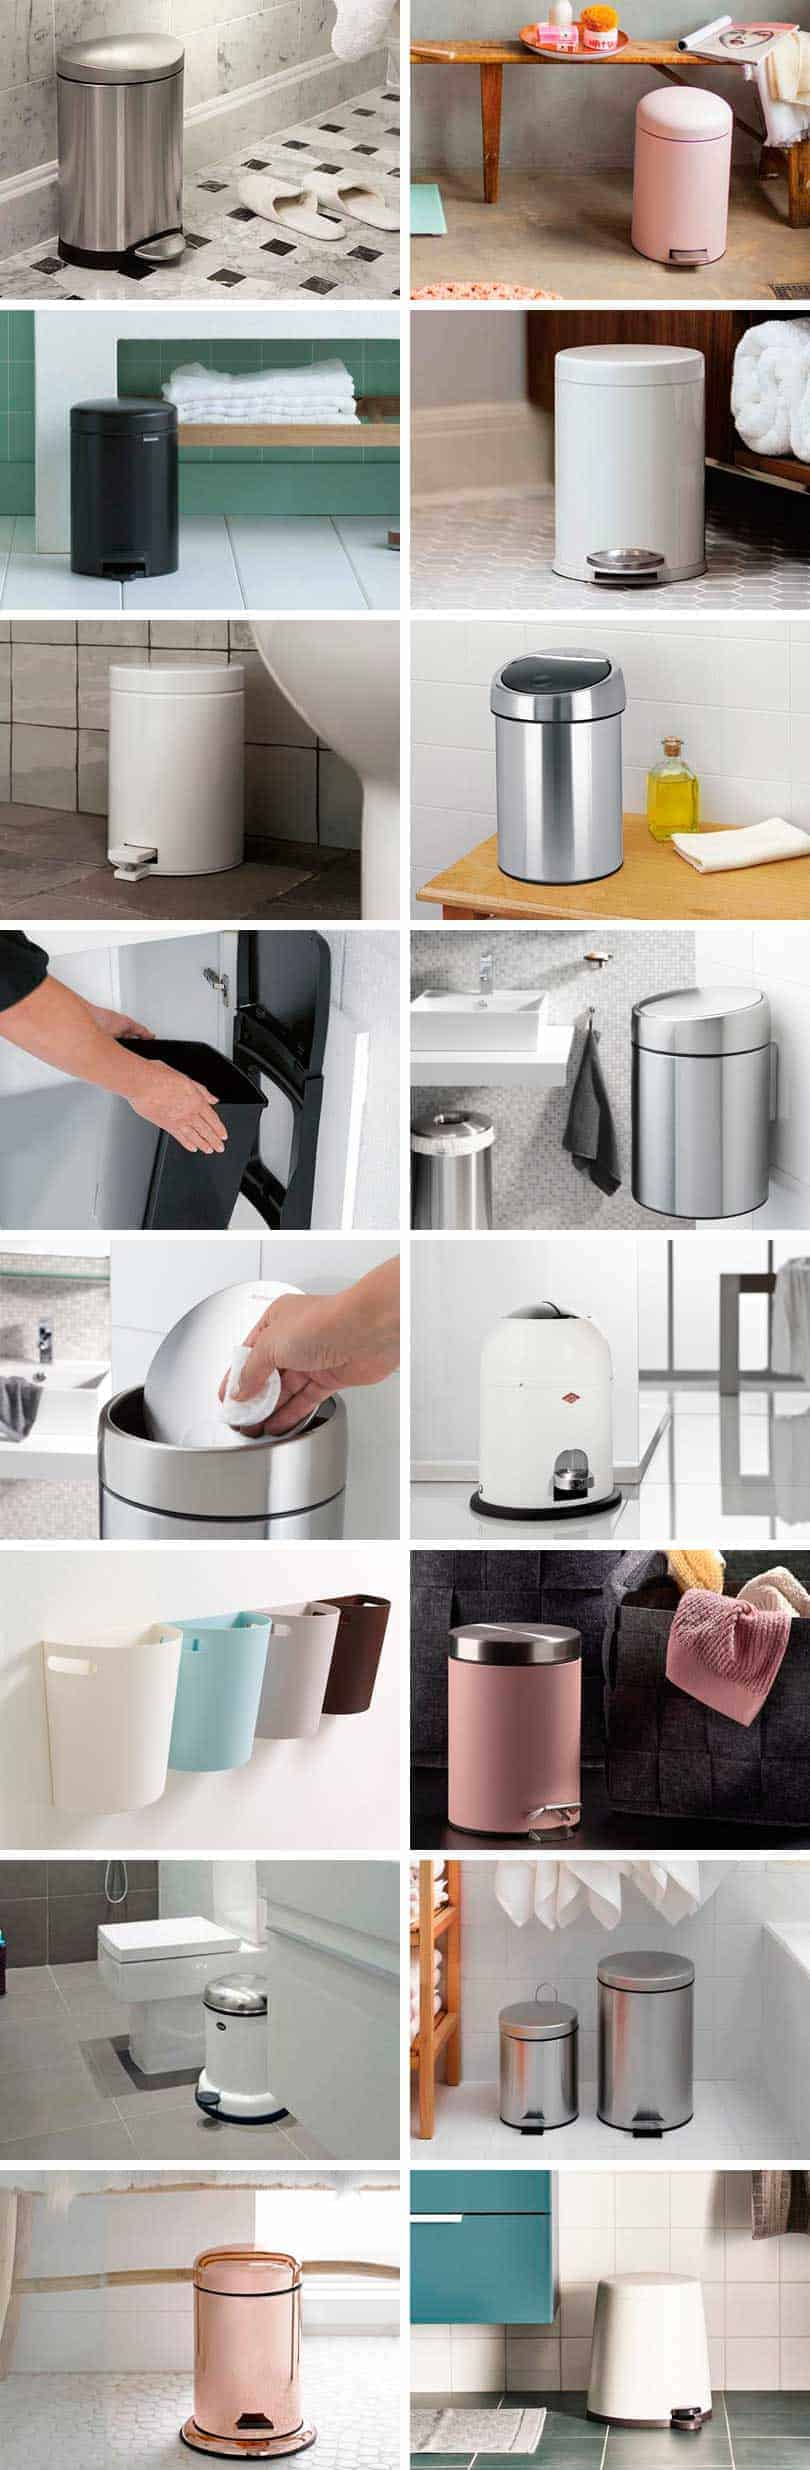 small-trash-can-bathroom-restroom-decorative